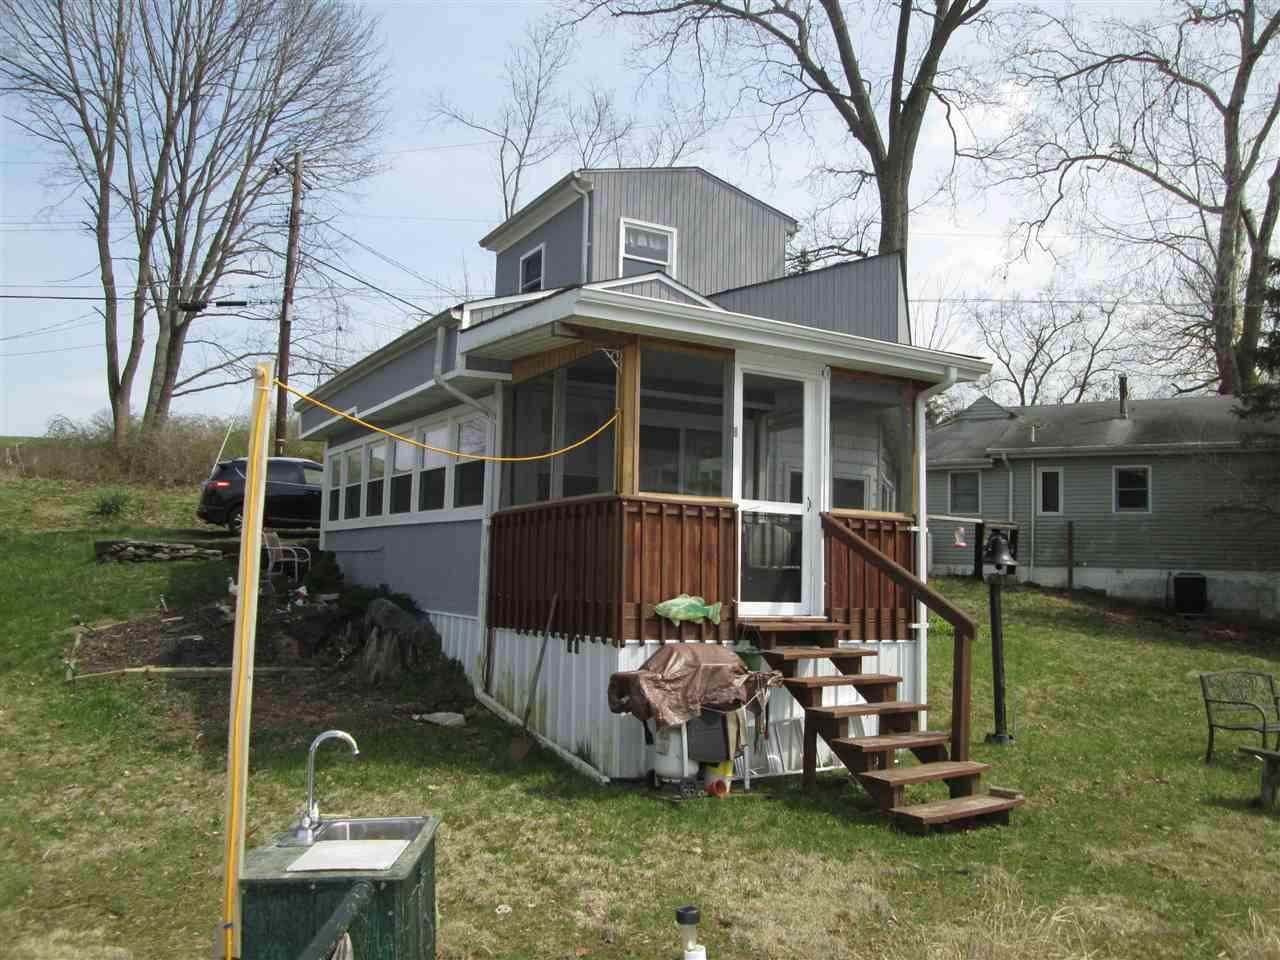 Photo 3 for 23 Boone Lake Cir Walton, KY 41094